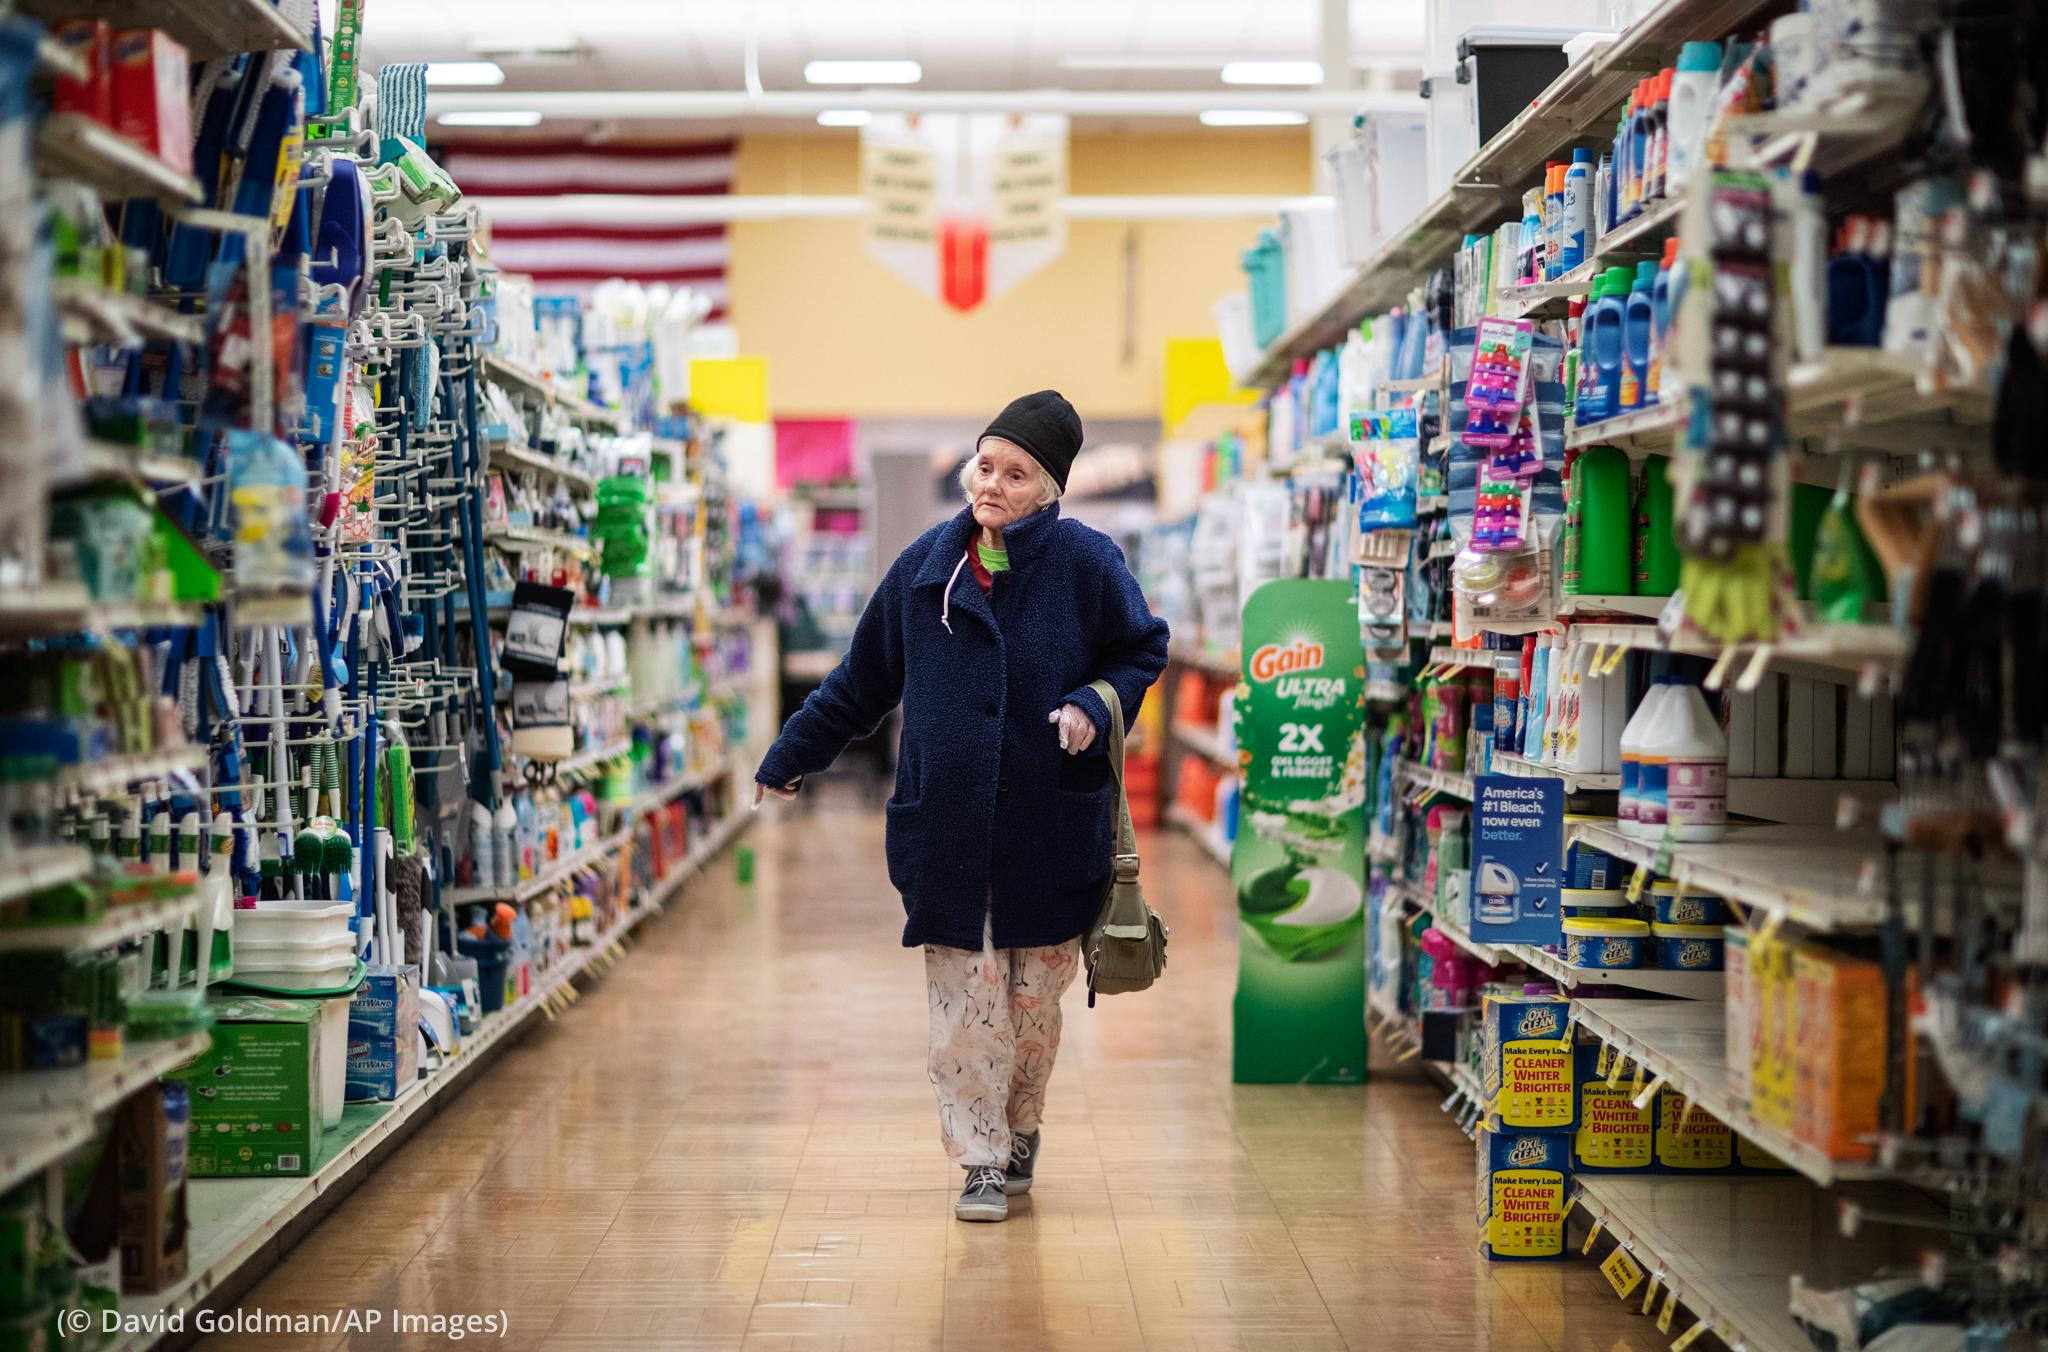 Person walking down a grocery store aisle (© David Goldman/AP Images)